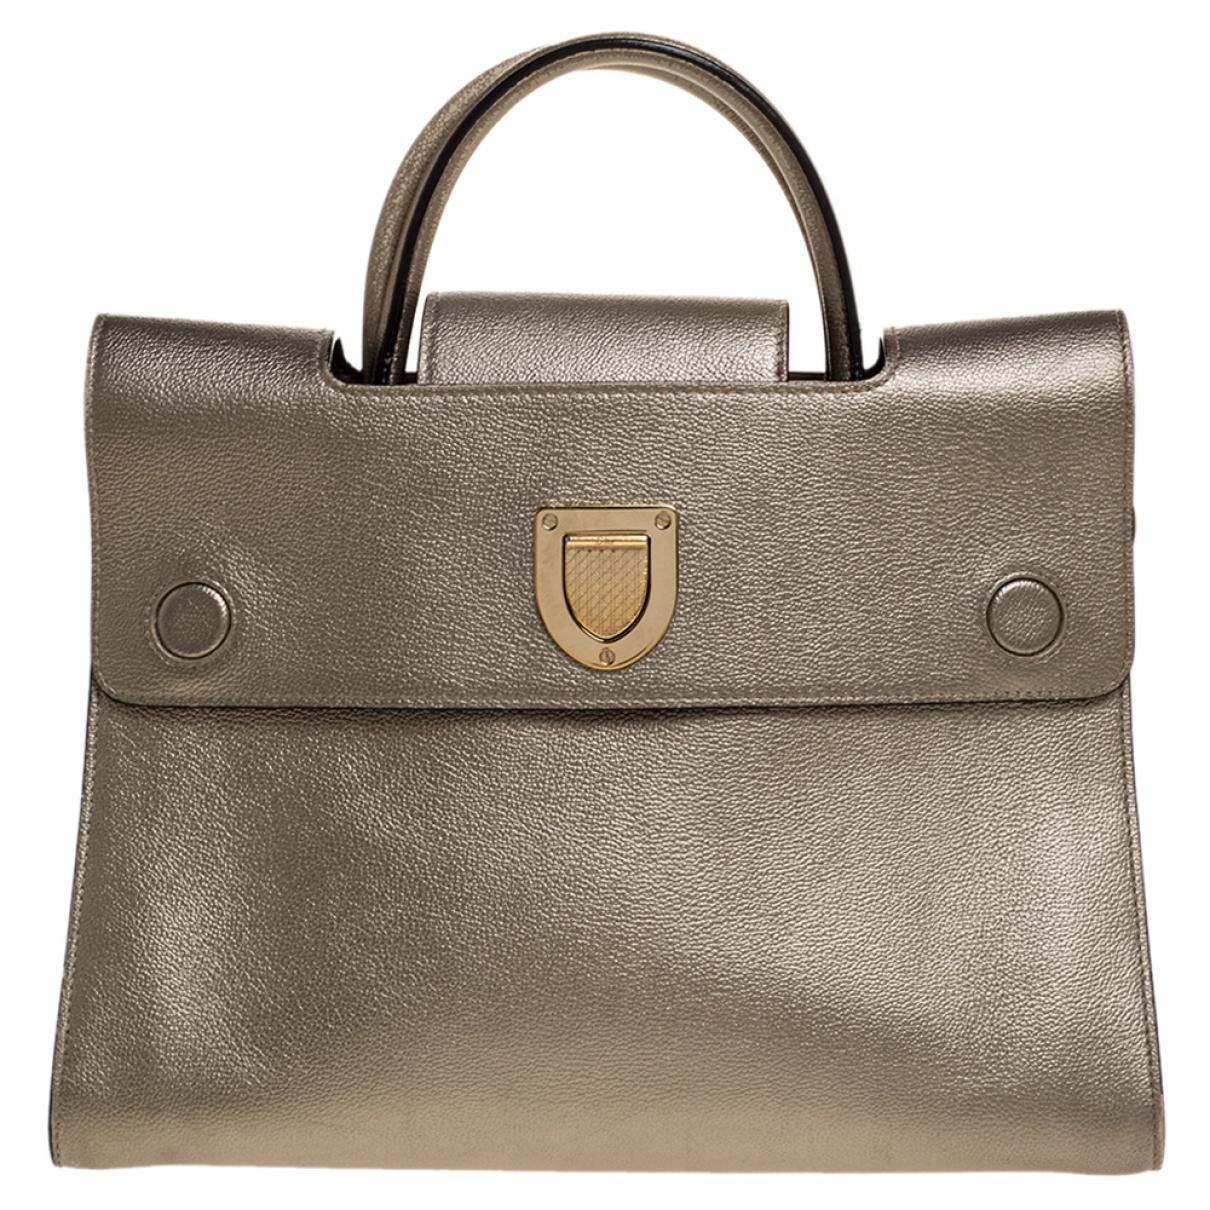 Dior N Metallic Leather handbag for Women N